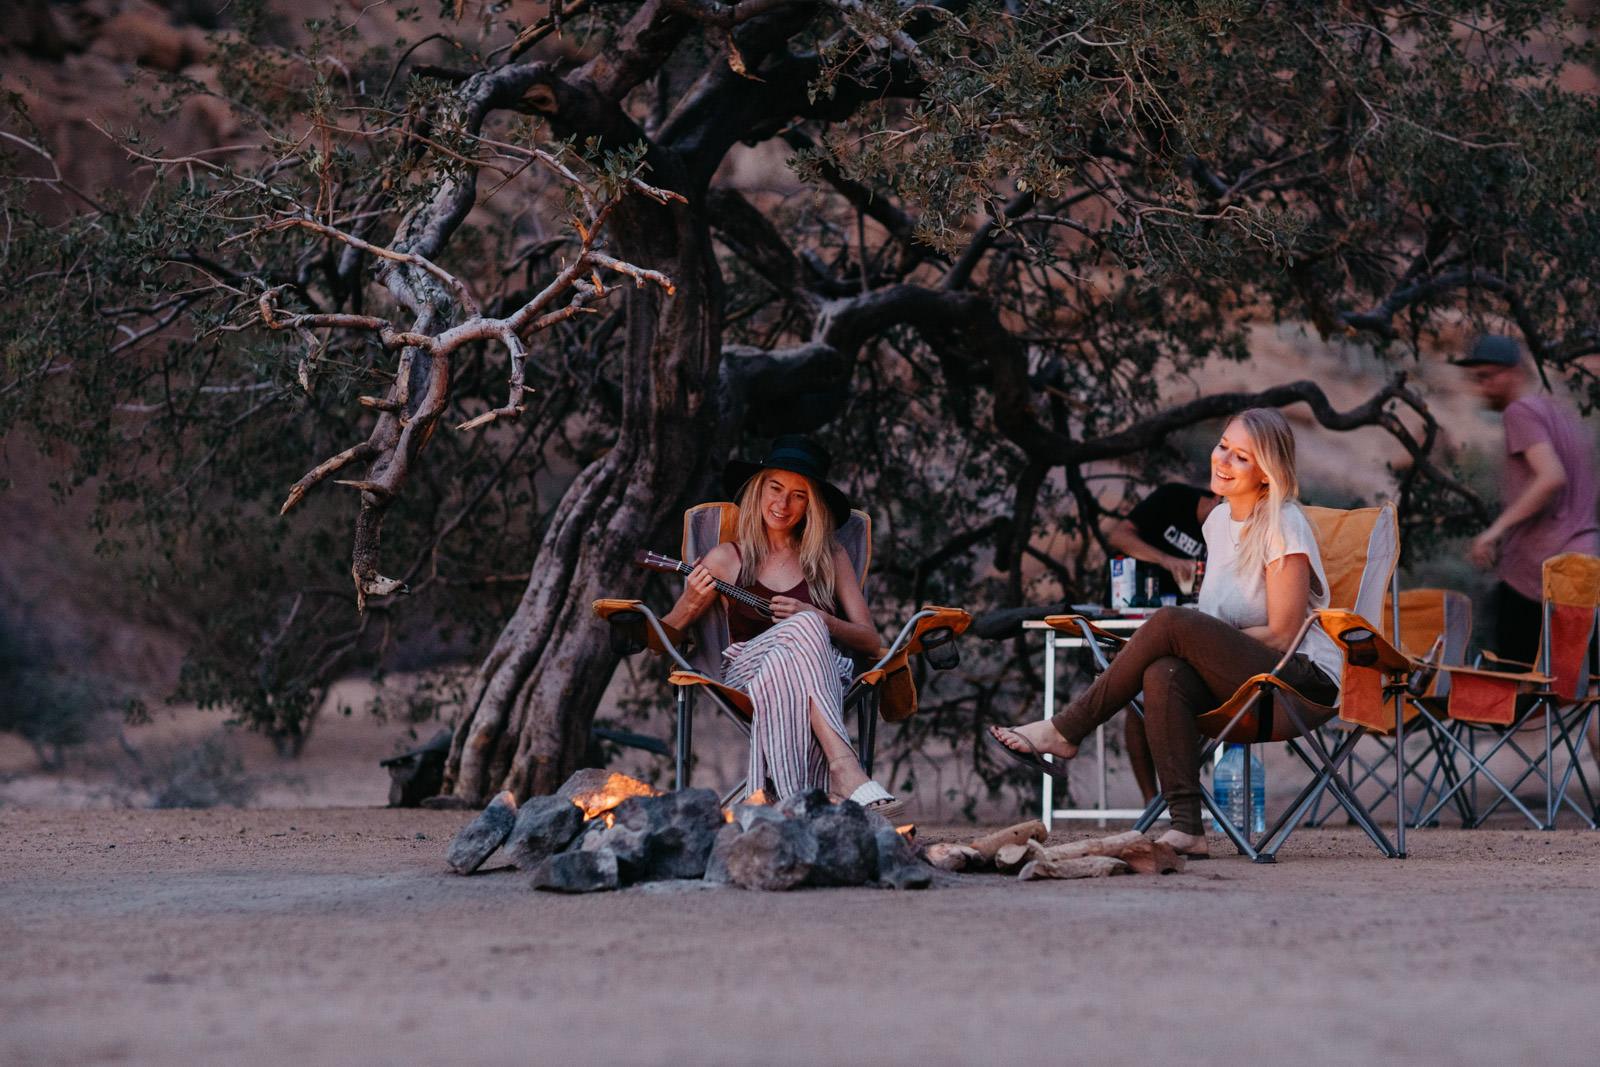 namibia_trip_rooftent_camping_roadtrip (18 von 18).jpg